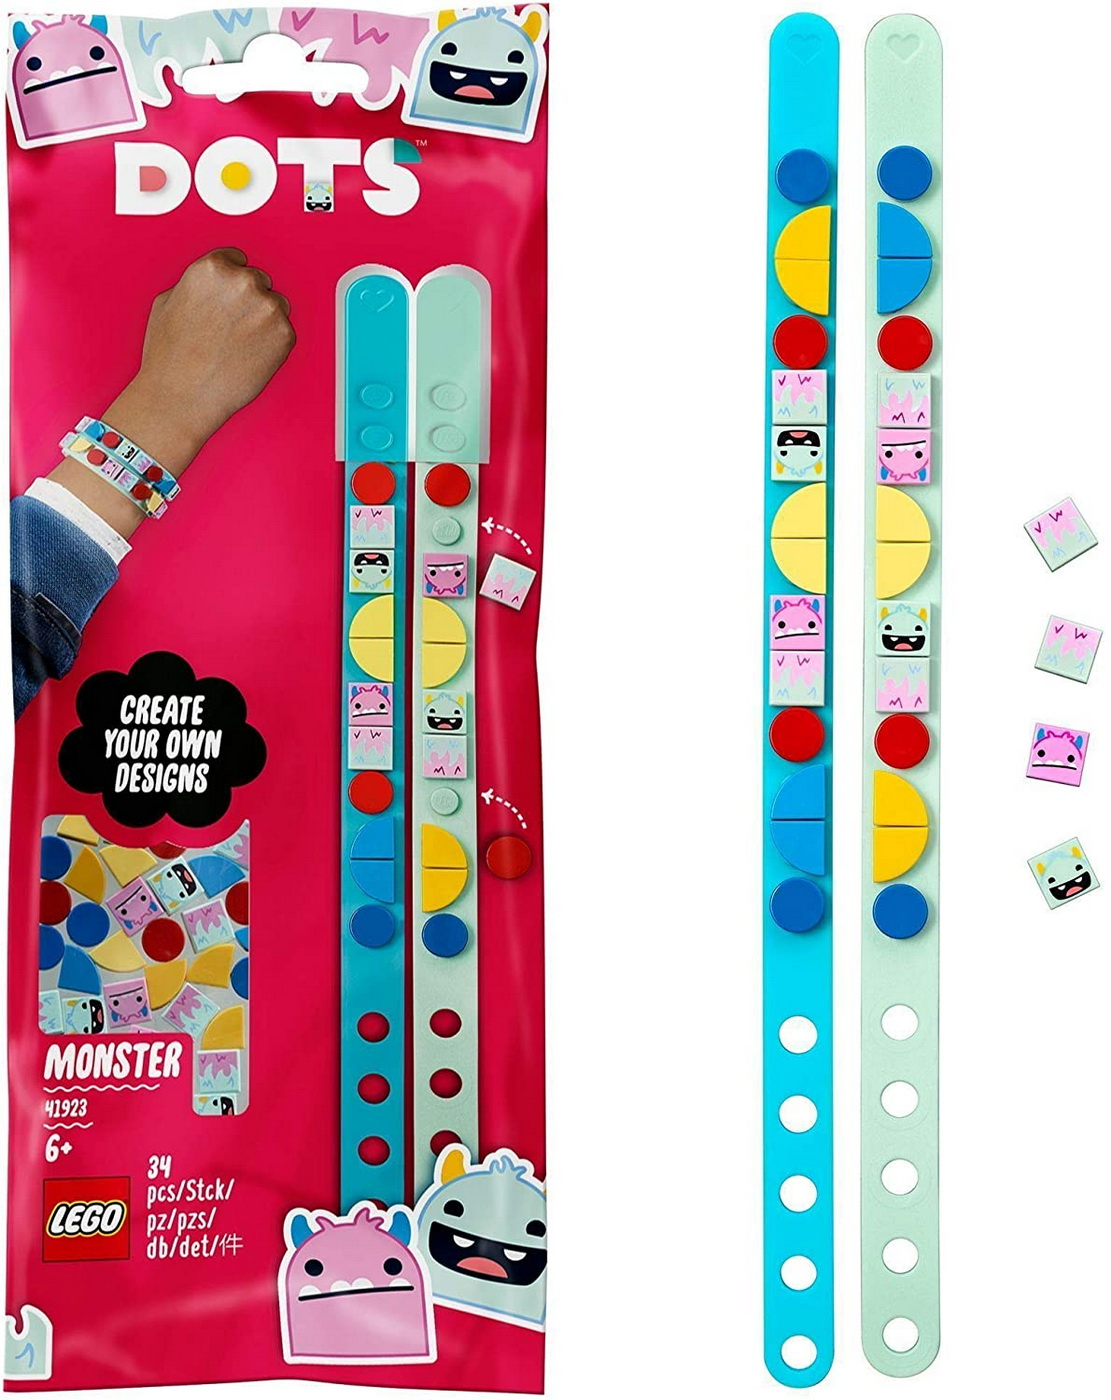 Lego Dots Bratara Cu Monstruleti 41923